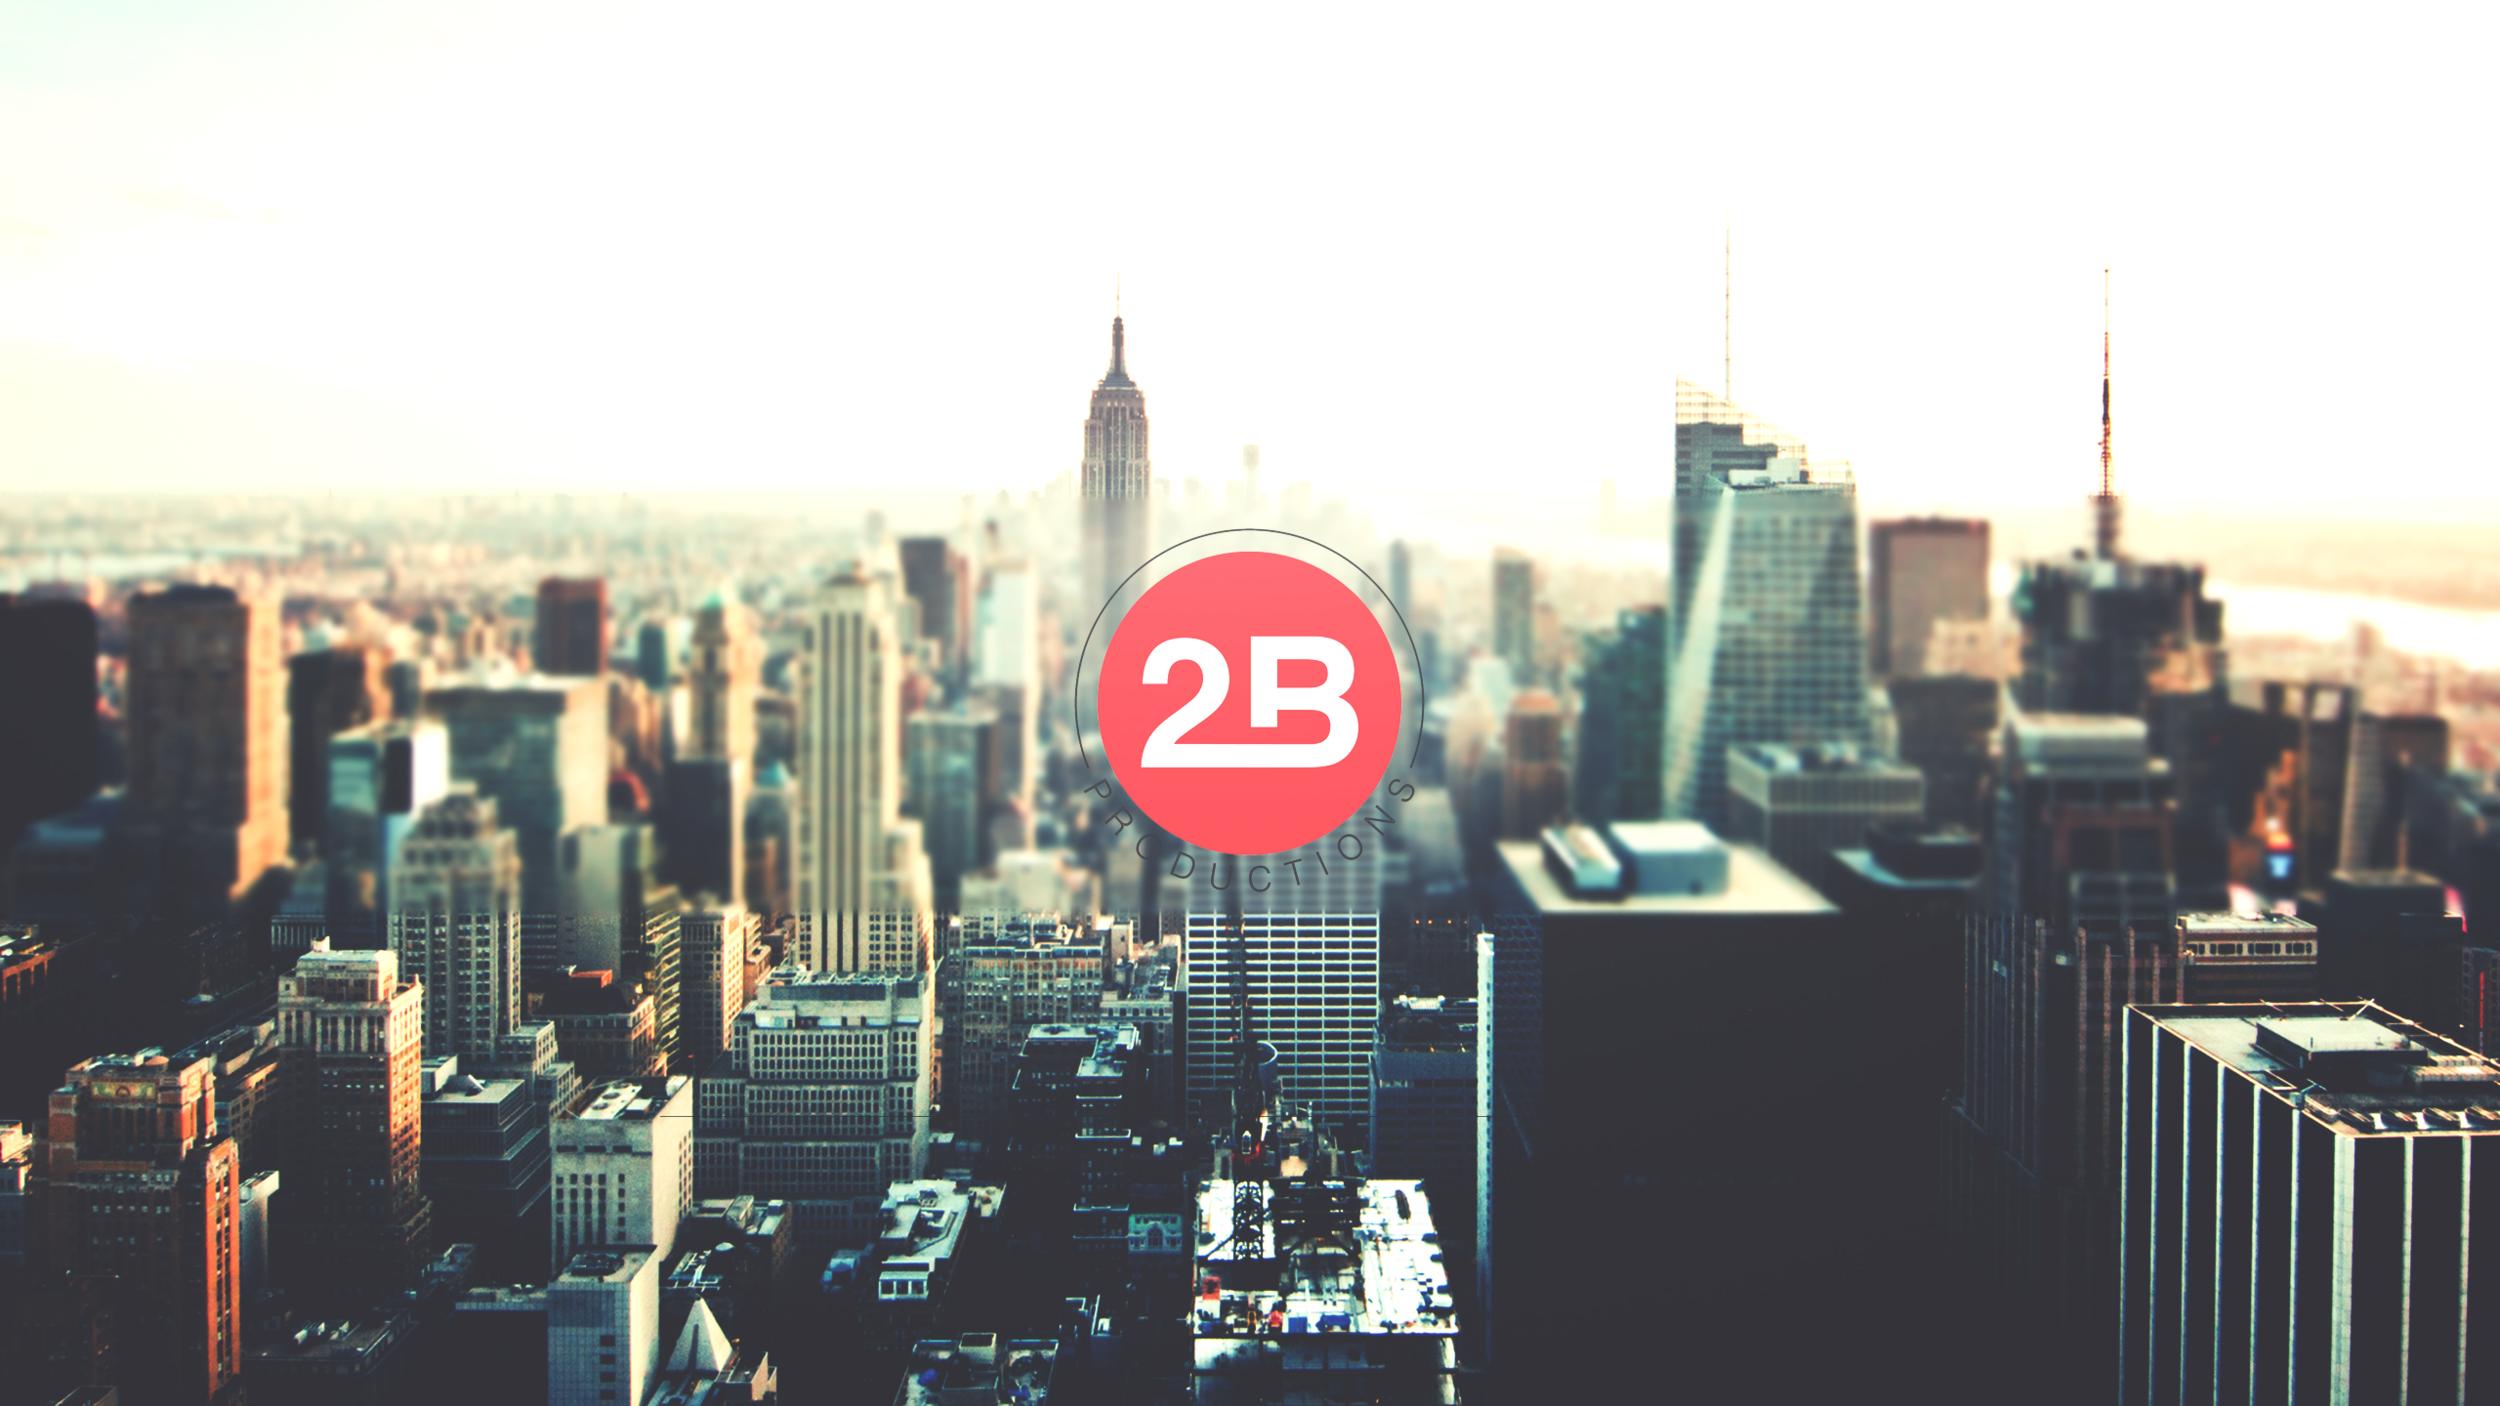 Youtube-TwoBridges-New York - 2bridges-beltran.png